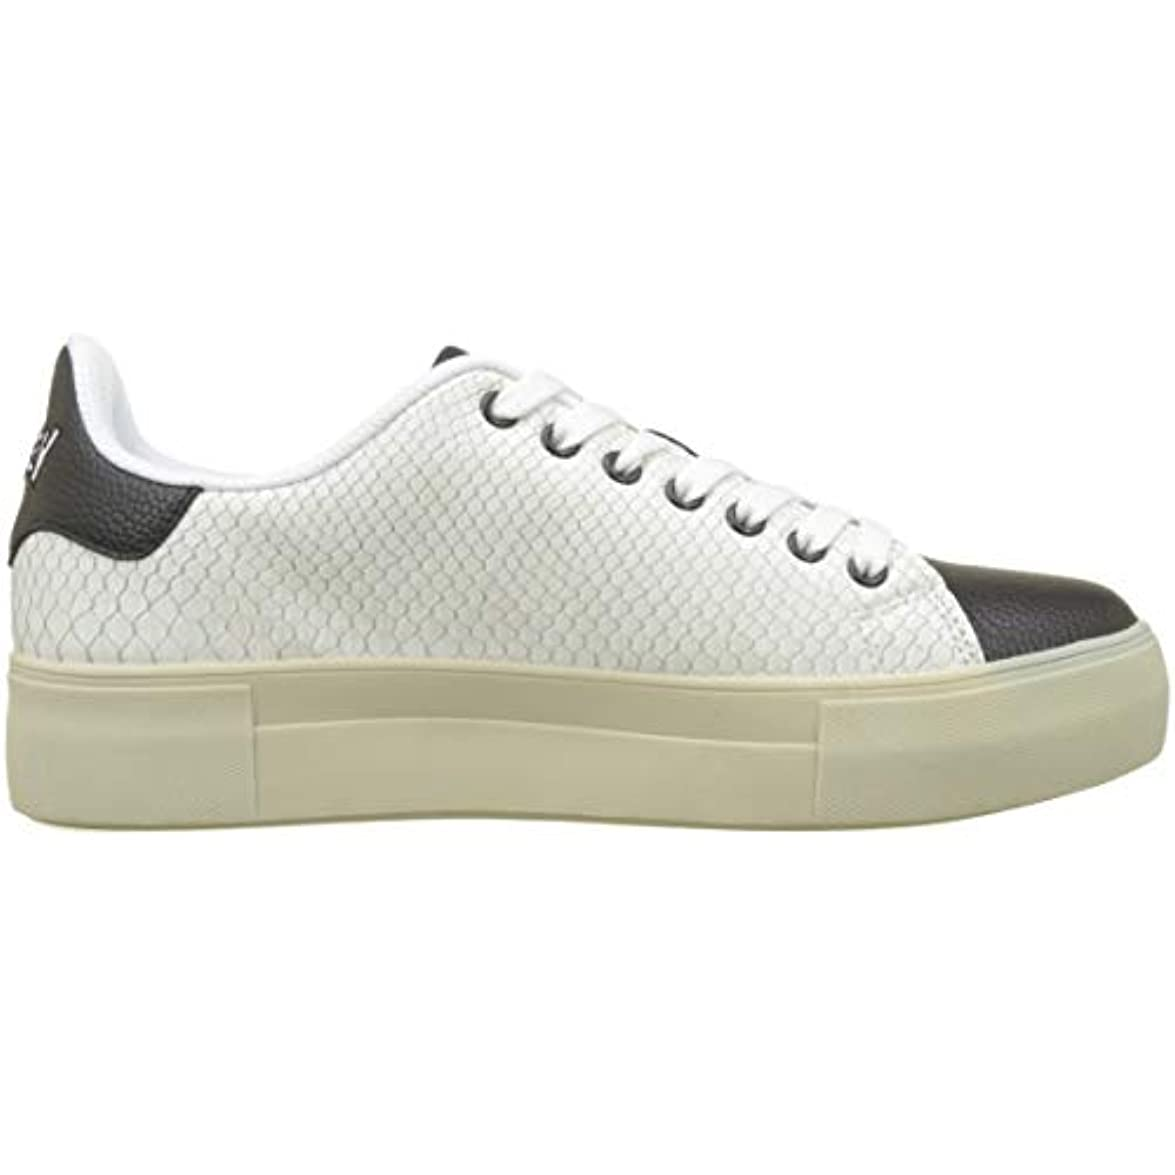 Desigual Shoes star Mickey Scarpe Da Ginnastica Basse Donna